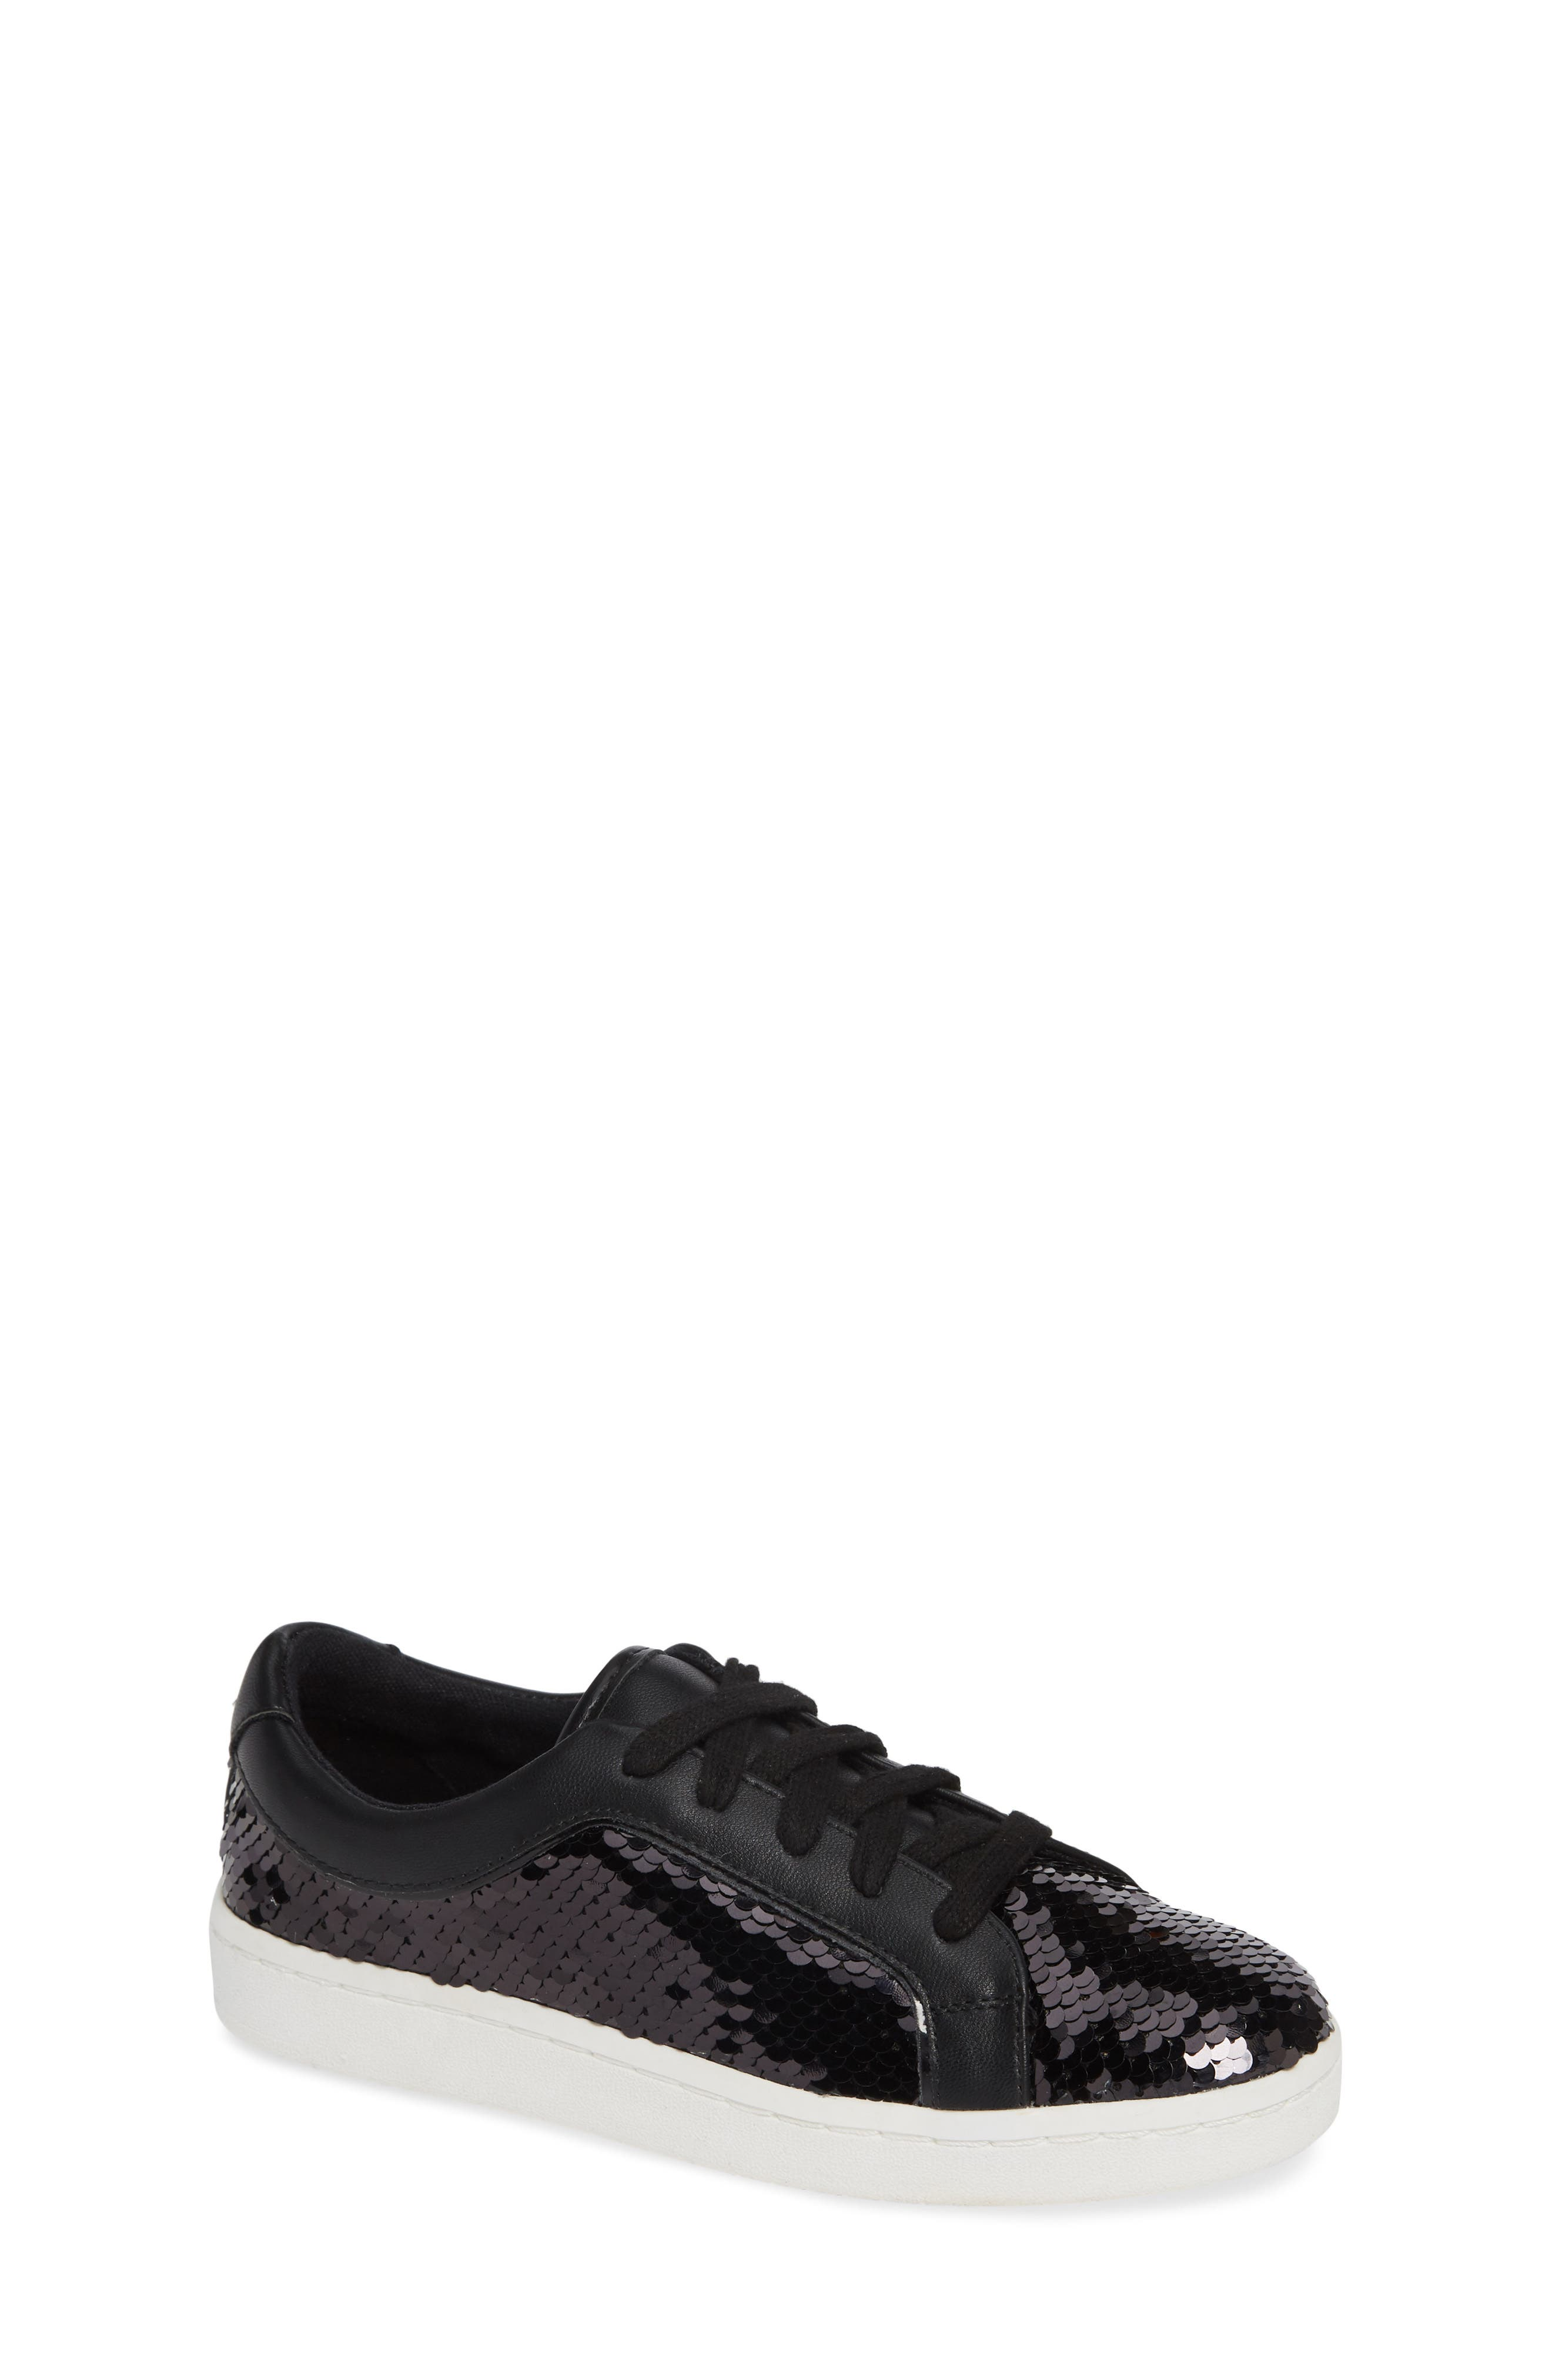 Blane Elizia Sequin Sneaker,                             Main thumbnail 1, color,                             BLACK SILVER